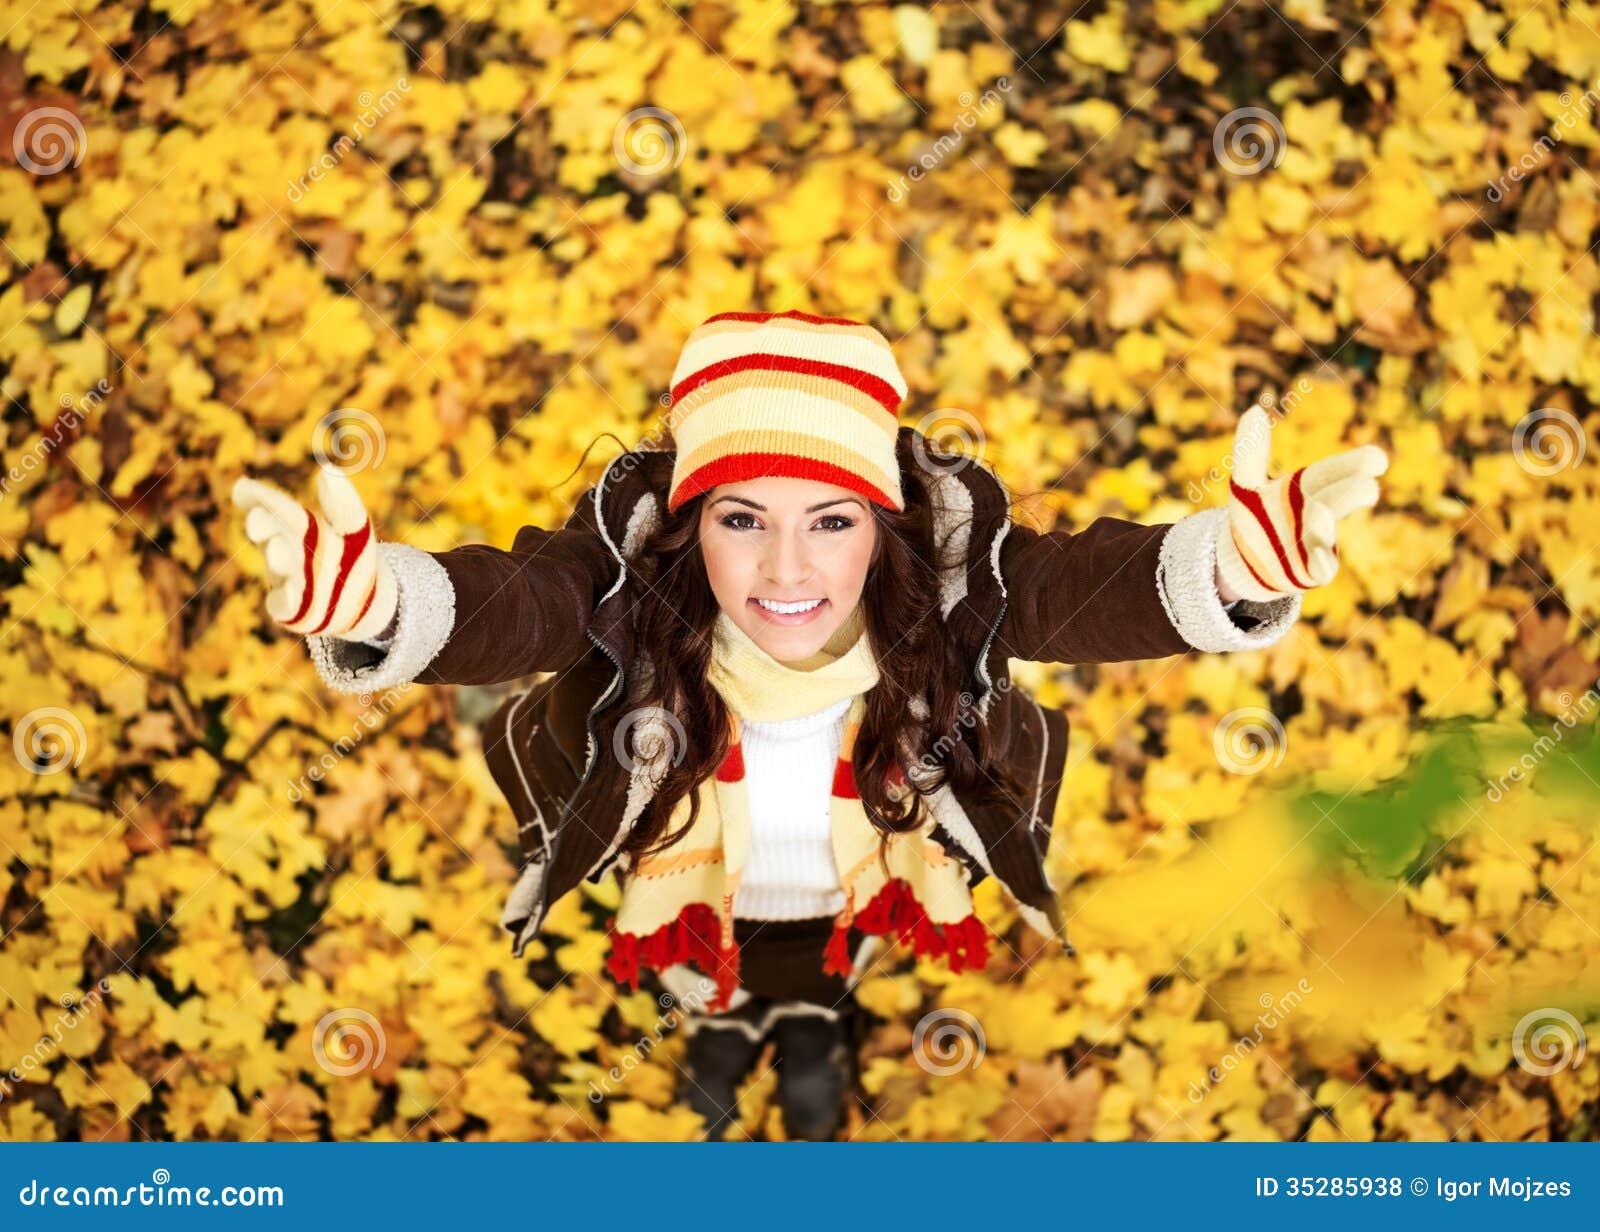 Woman in autumn orange leaves, outdoor